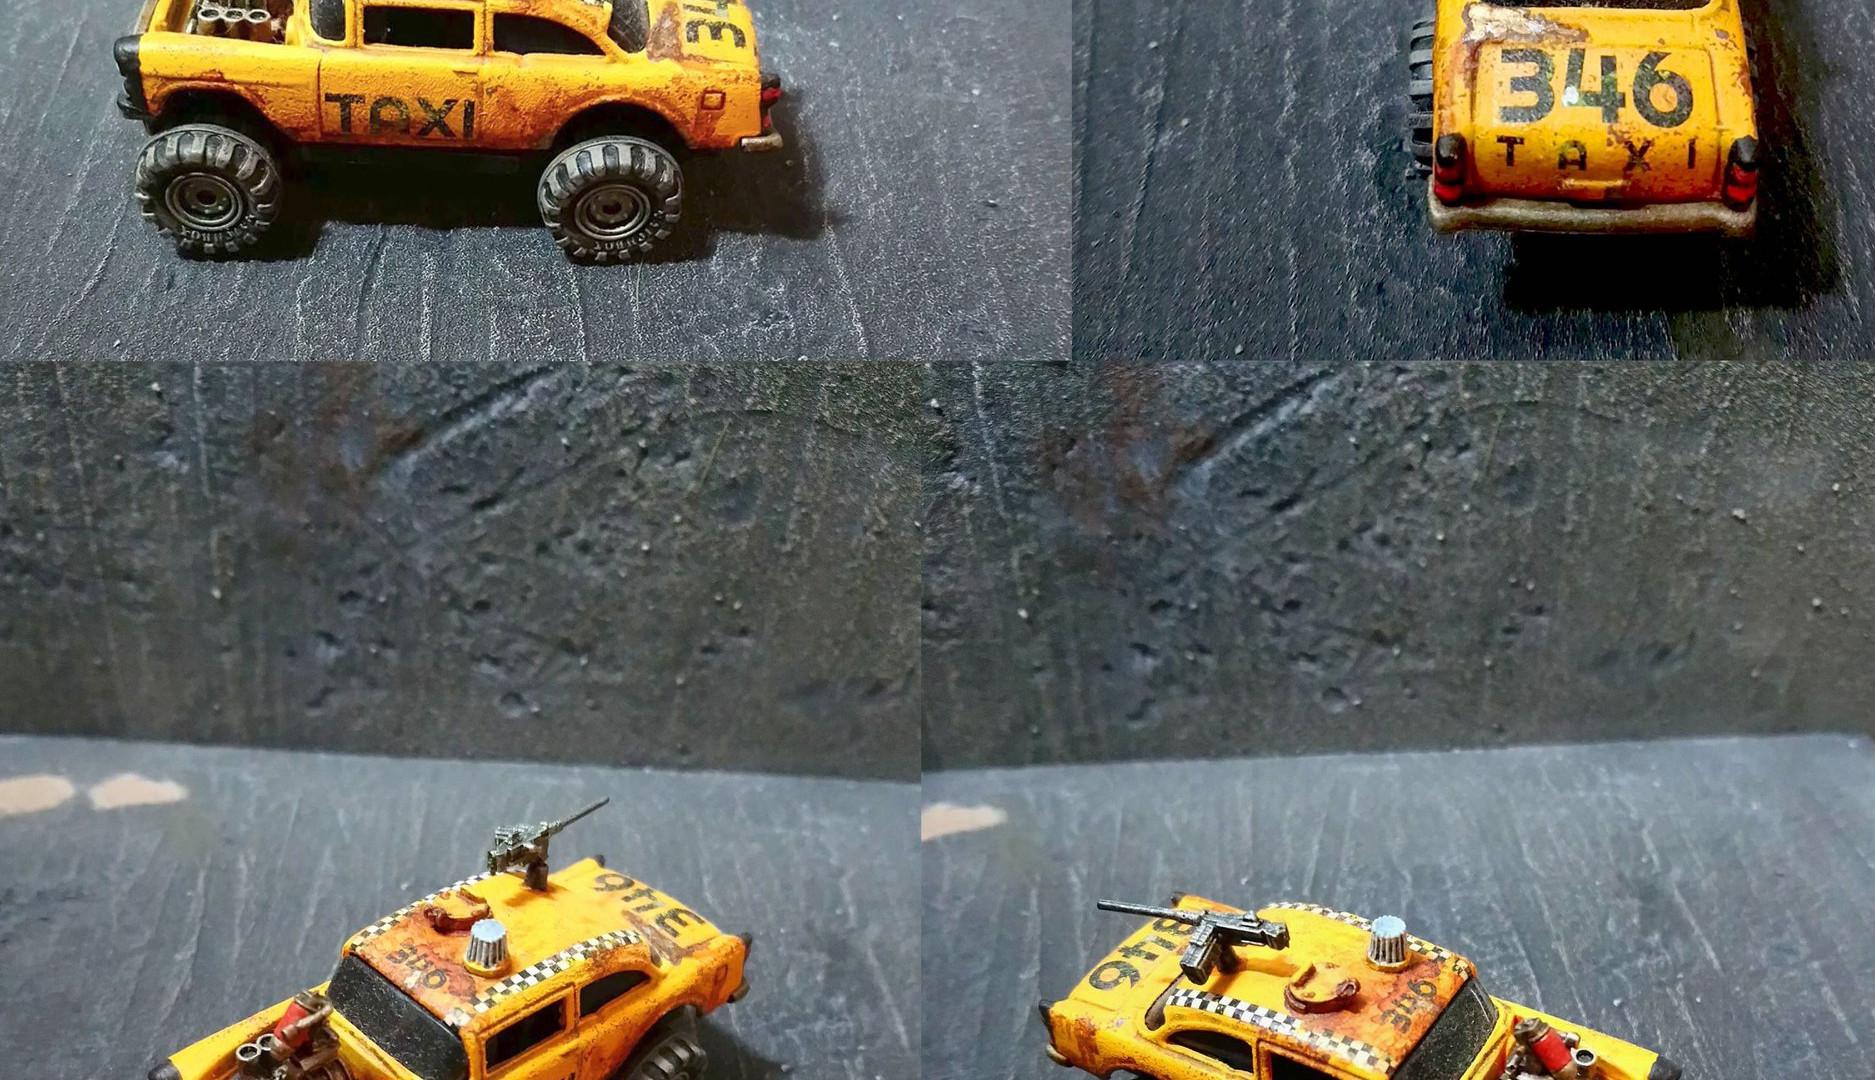 Cab Cultist Three Forty Six